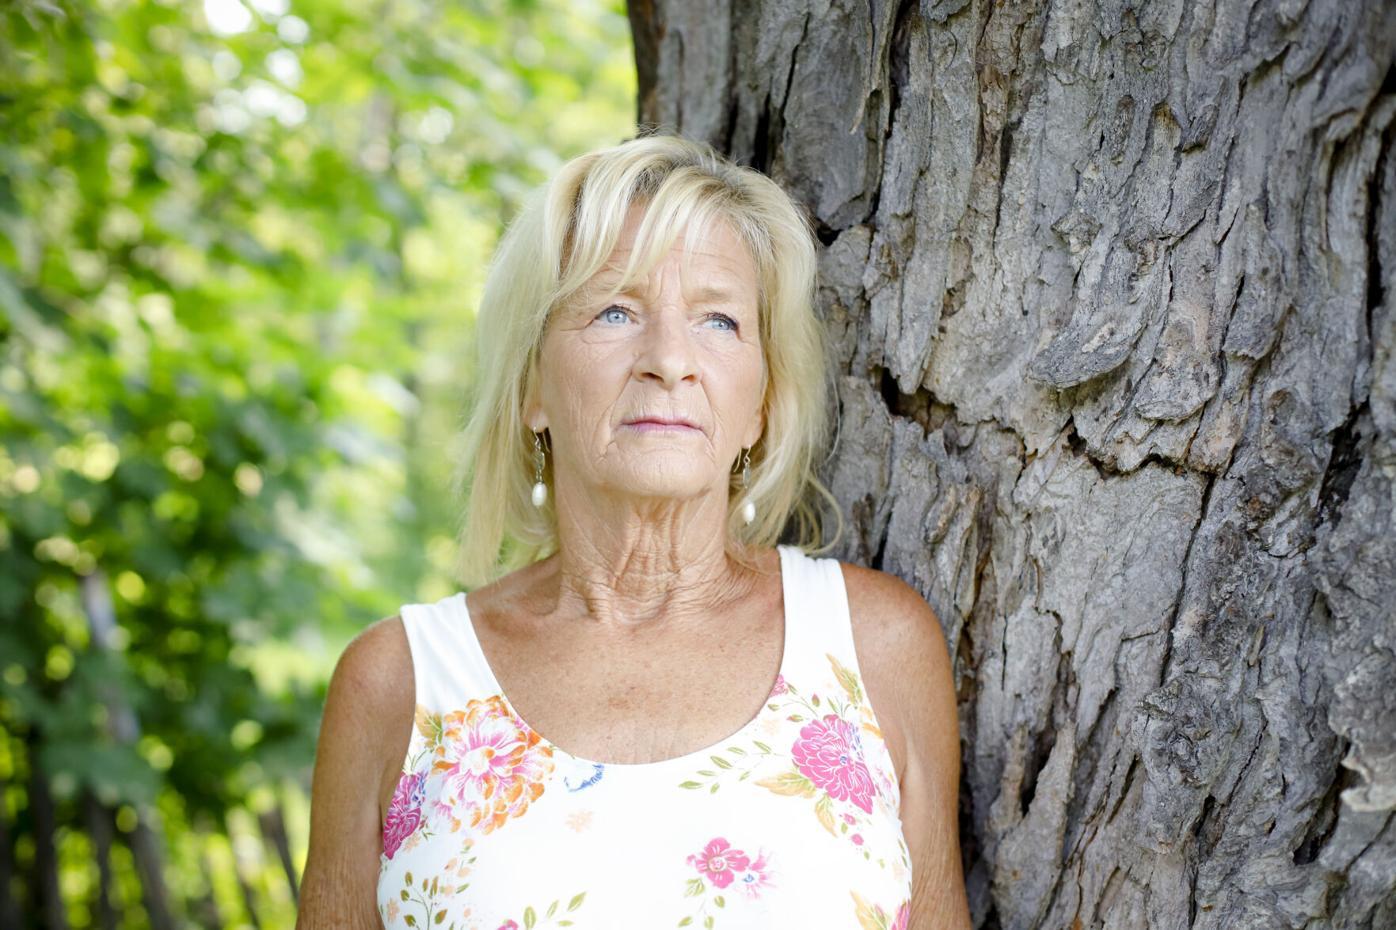 Sheri Biasin leaning against tree